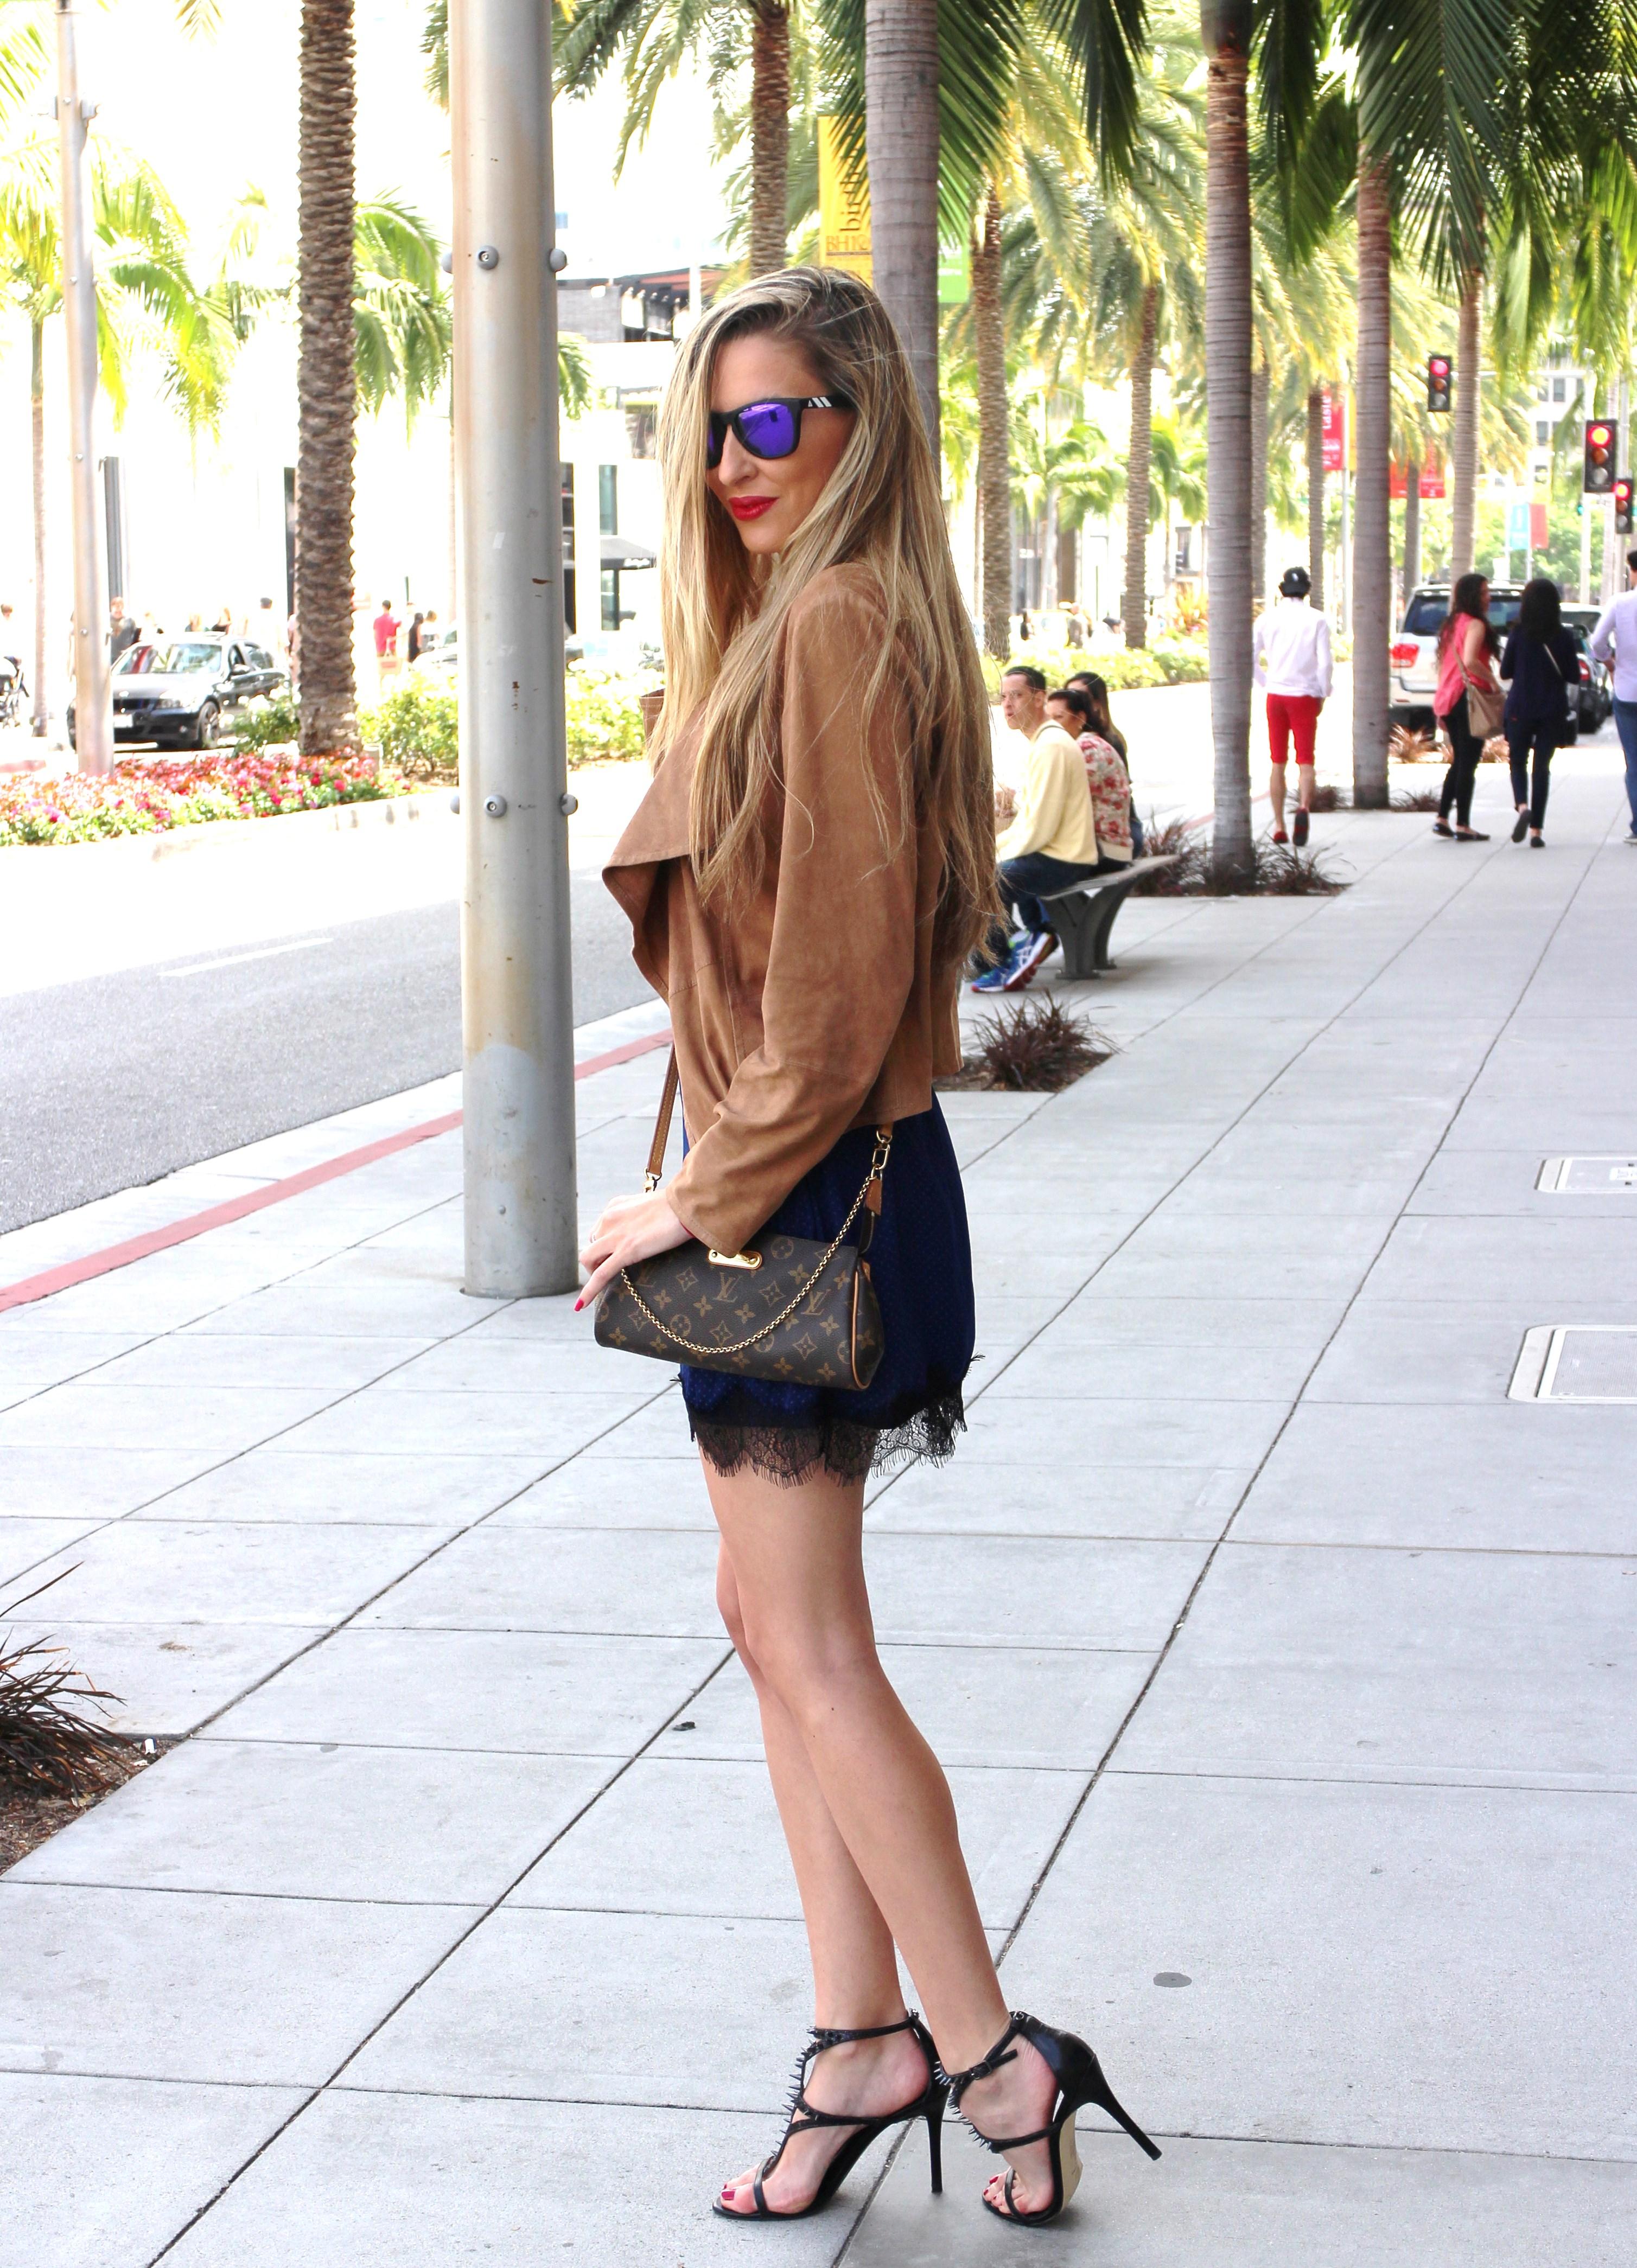 Rodeo_Drive_Los_Angeles_California_Shopping_Lara_Martin_Gilarranz_Bymyheels (2)